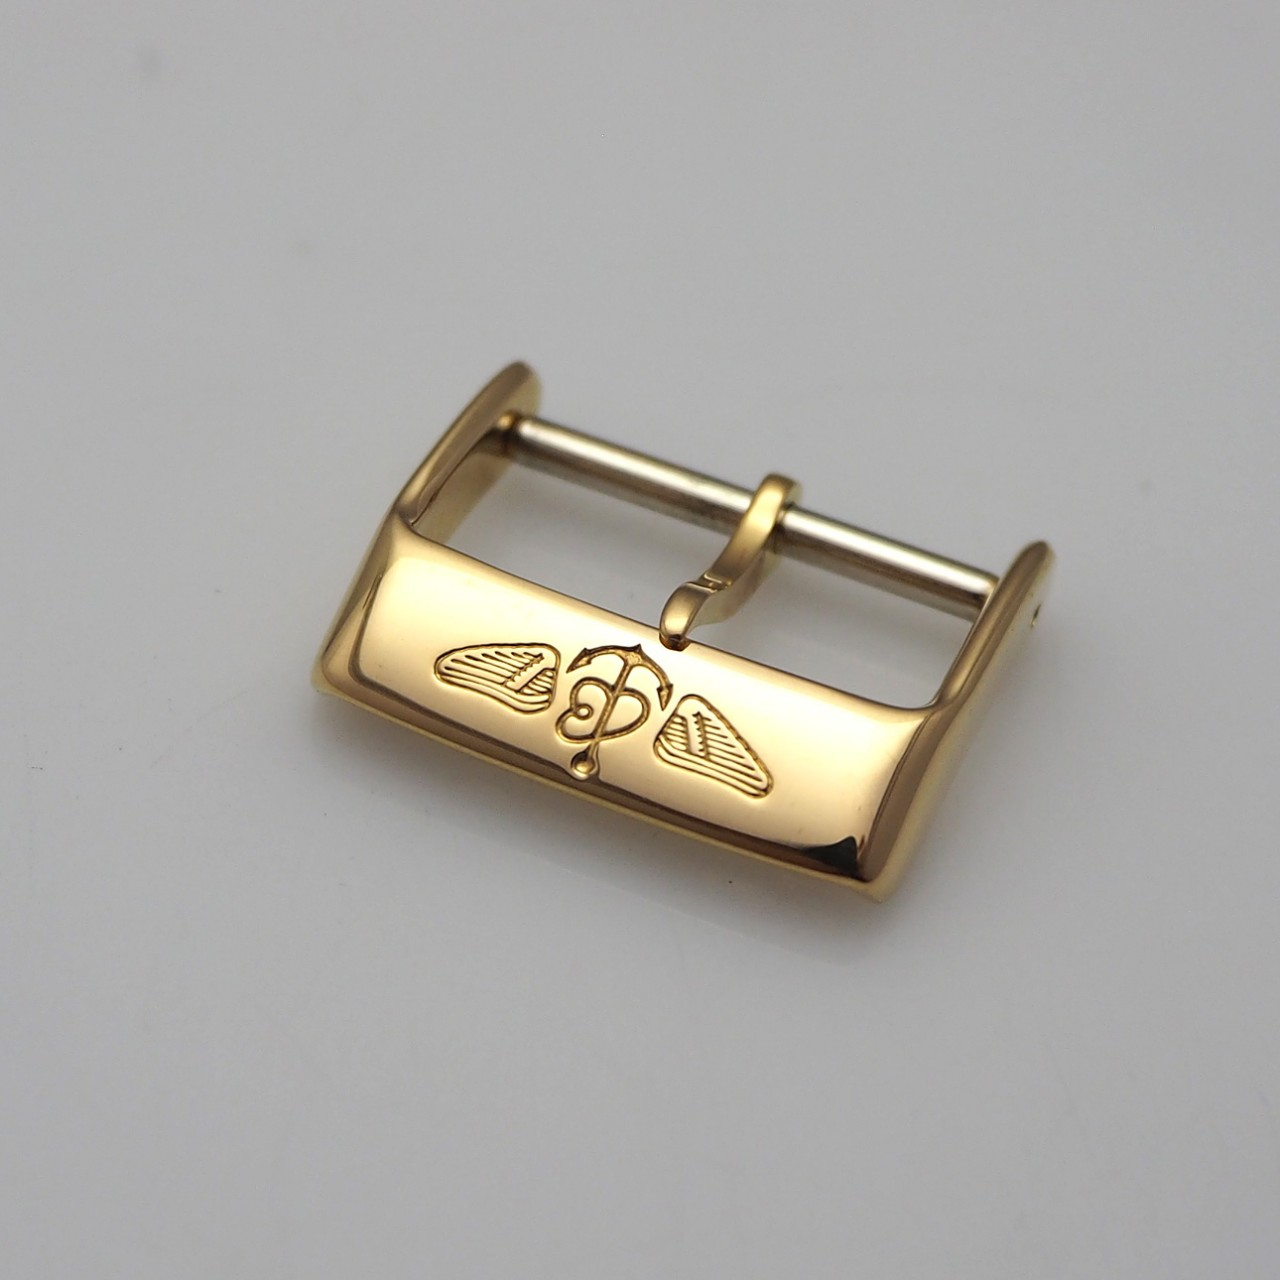 Breitling Dornschließe /Buckle/ Gold 18k/750, 18mm neuwertig